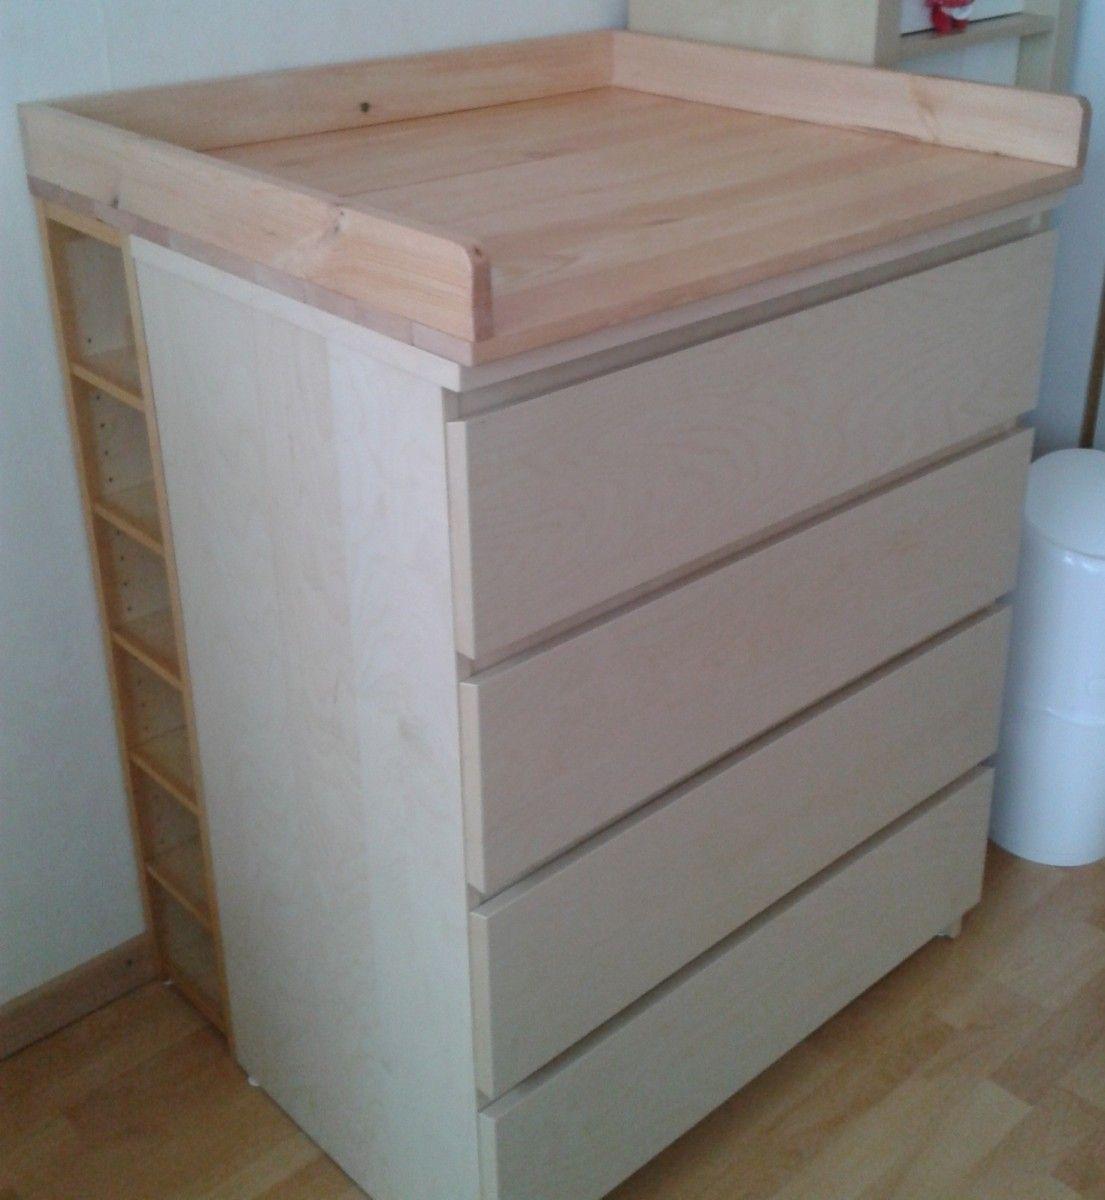 Meuble Ikea Transform En Table Langer B B Pinterest  # Meuble Ikea Transforme